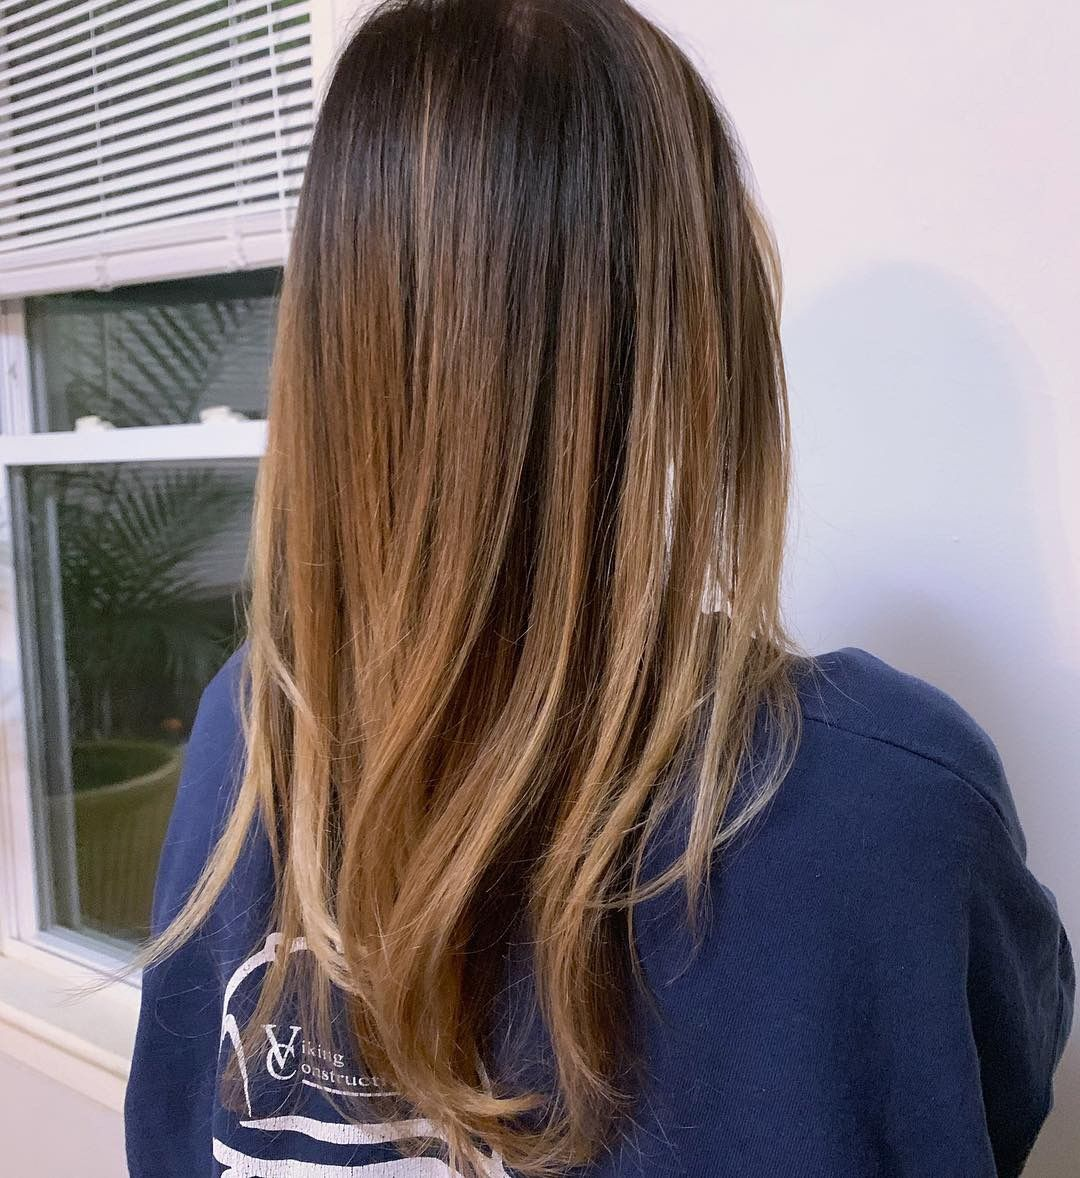 Soft Blend High Contrast Brown Blonde Balayage Lightened Using Schwarzkopf Blondme Ligh How To Lighten Brown Hair Brown To Blonde Balayage How To Lighten Hair